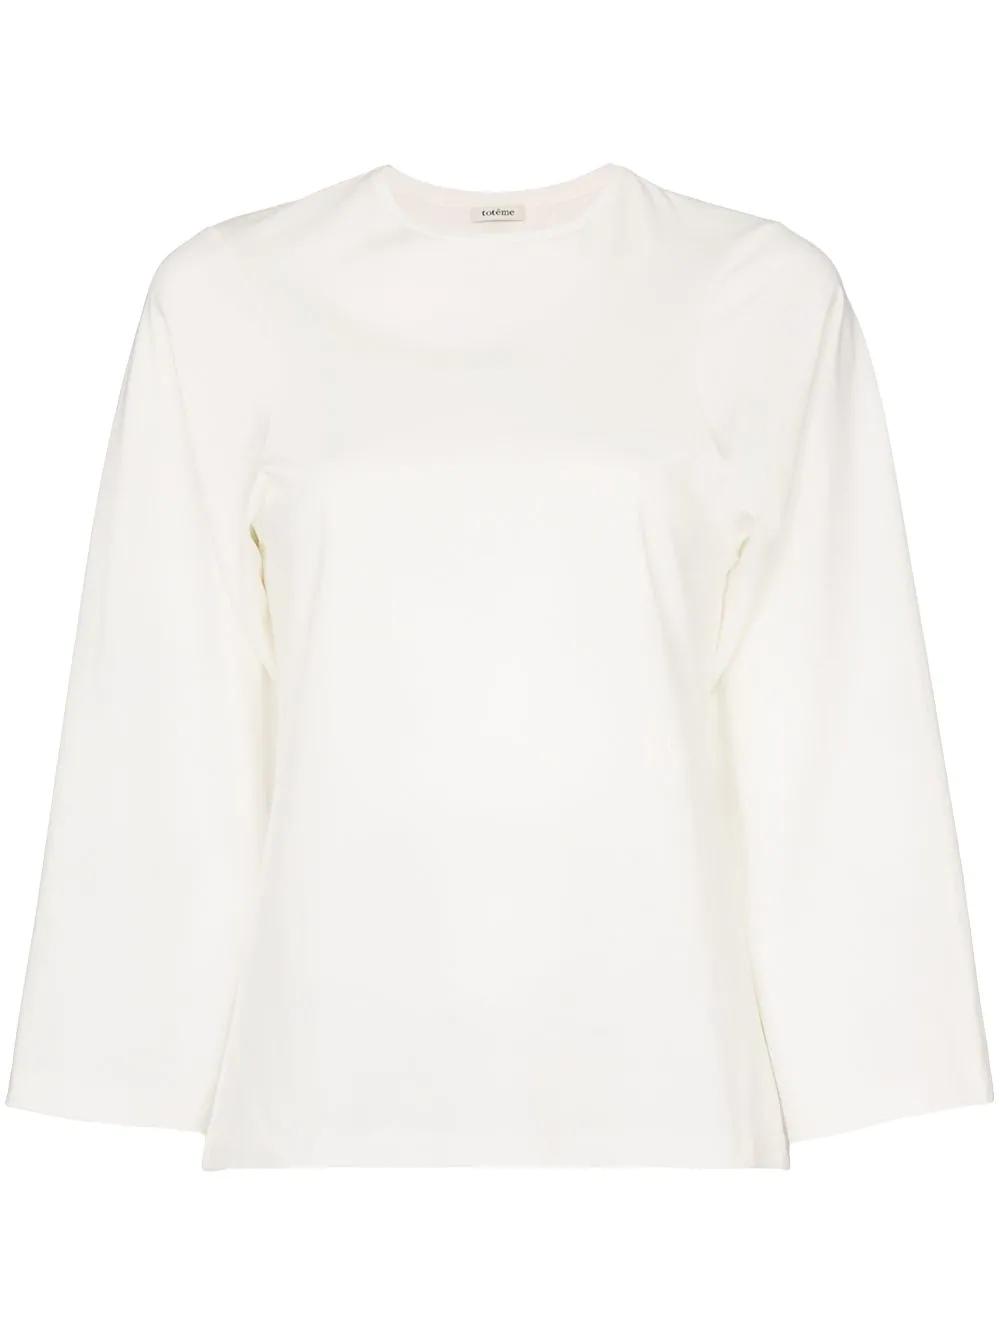 306b29a0db1eea TotÊMe Toteme Espera Three-Quarter Sleeve Cotton T-Shirt - White ...